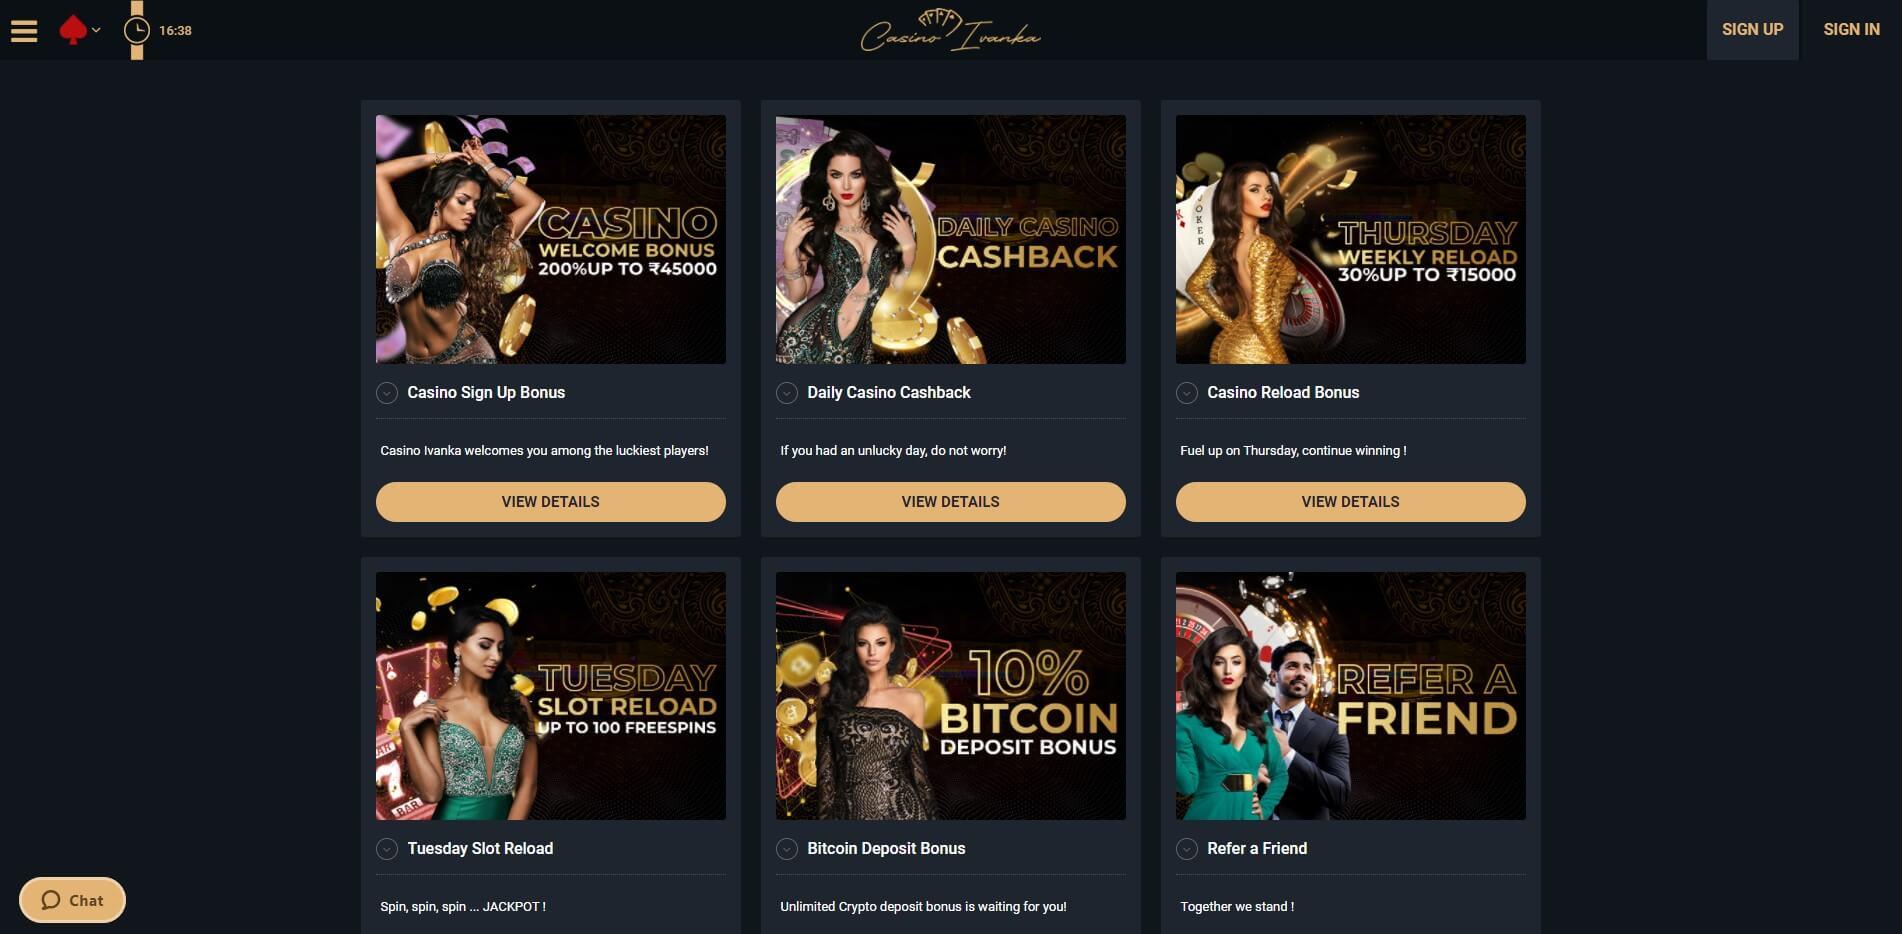 Promotions at Ivanka Casino